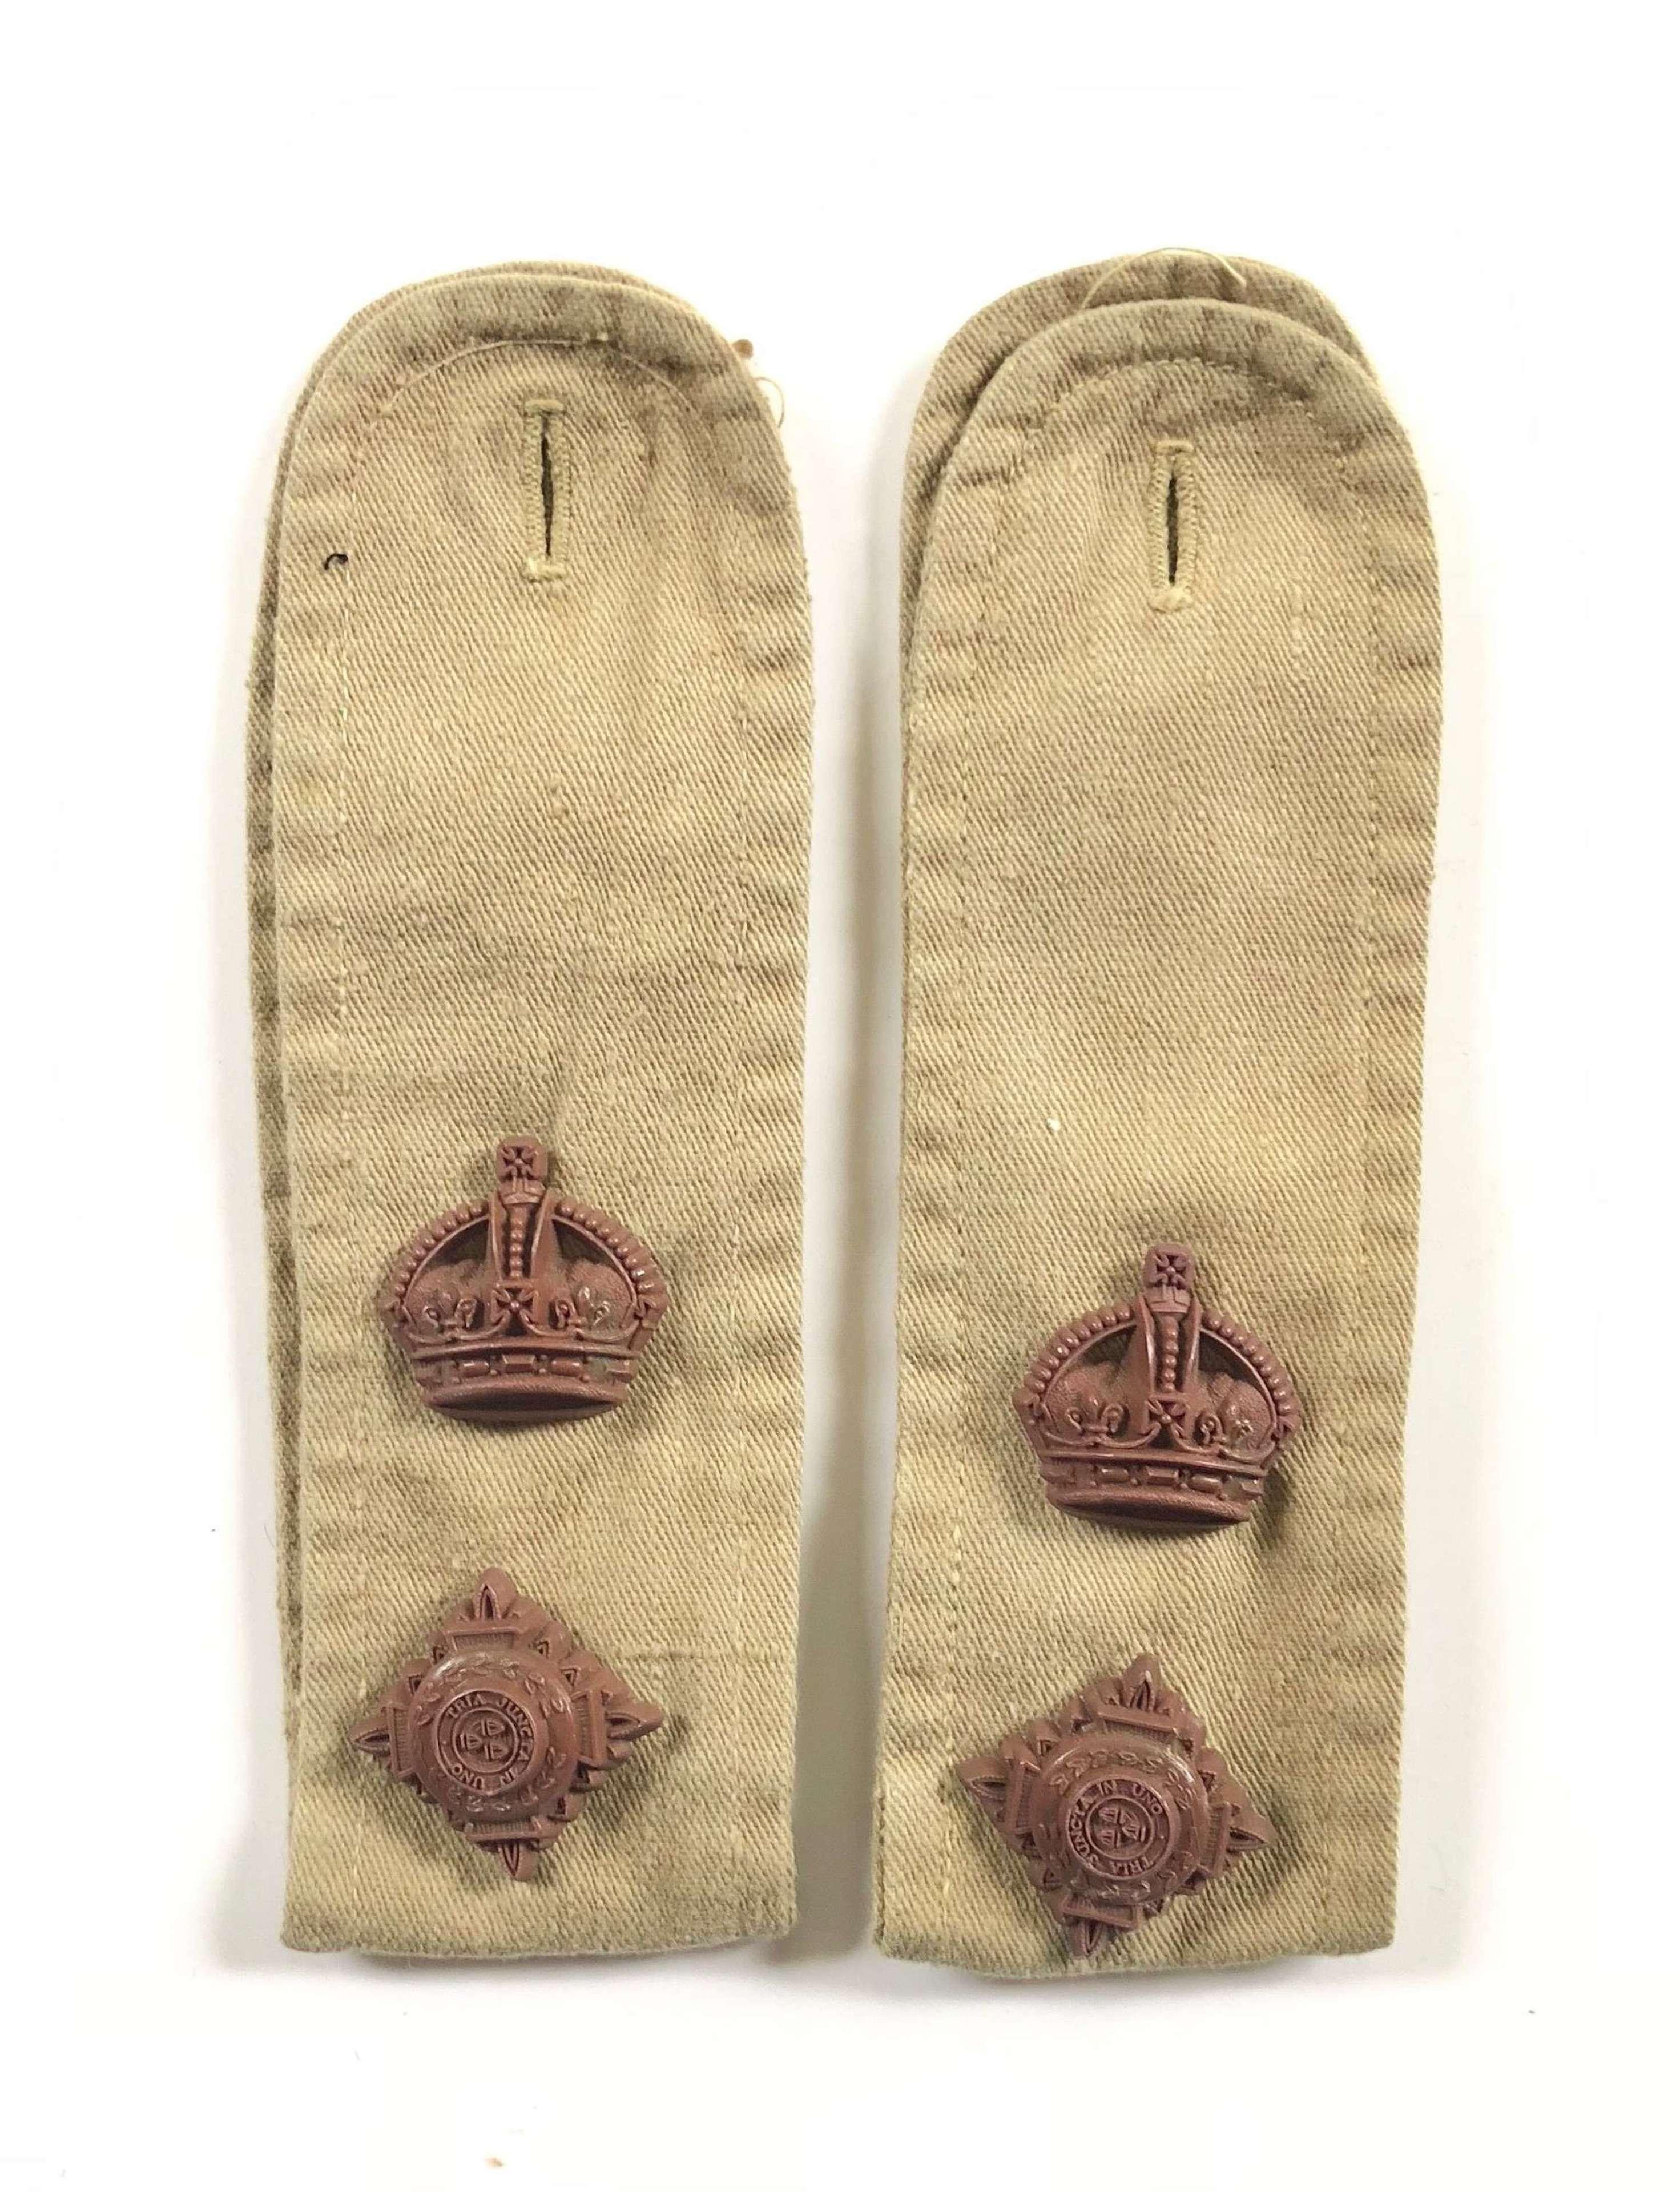 WW2 KD Lieutenant Colonel Economy Rank KD Shoulder Straps.